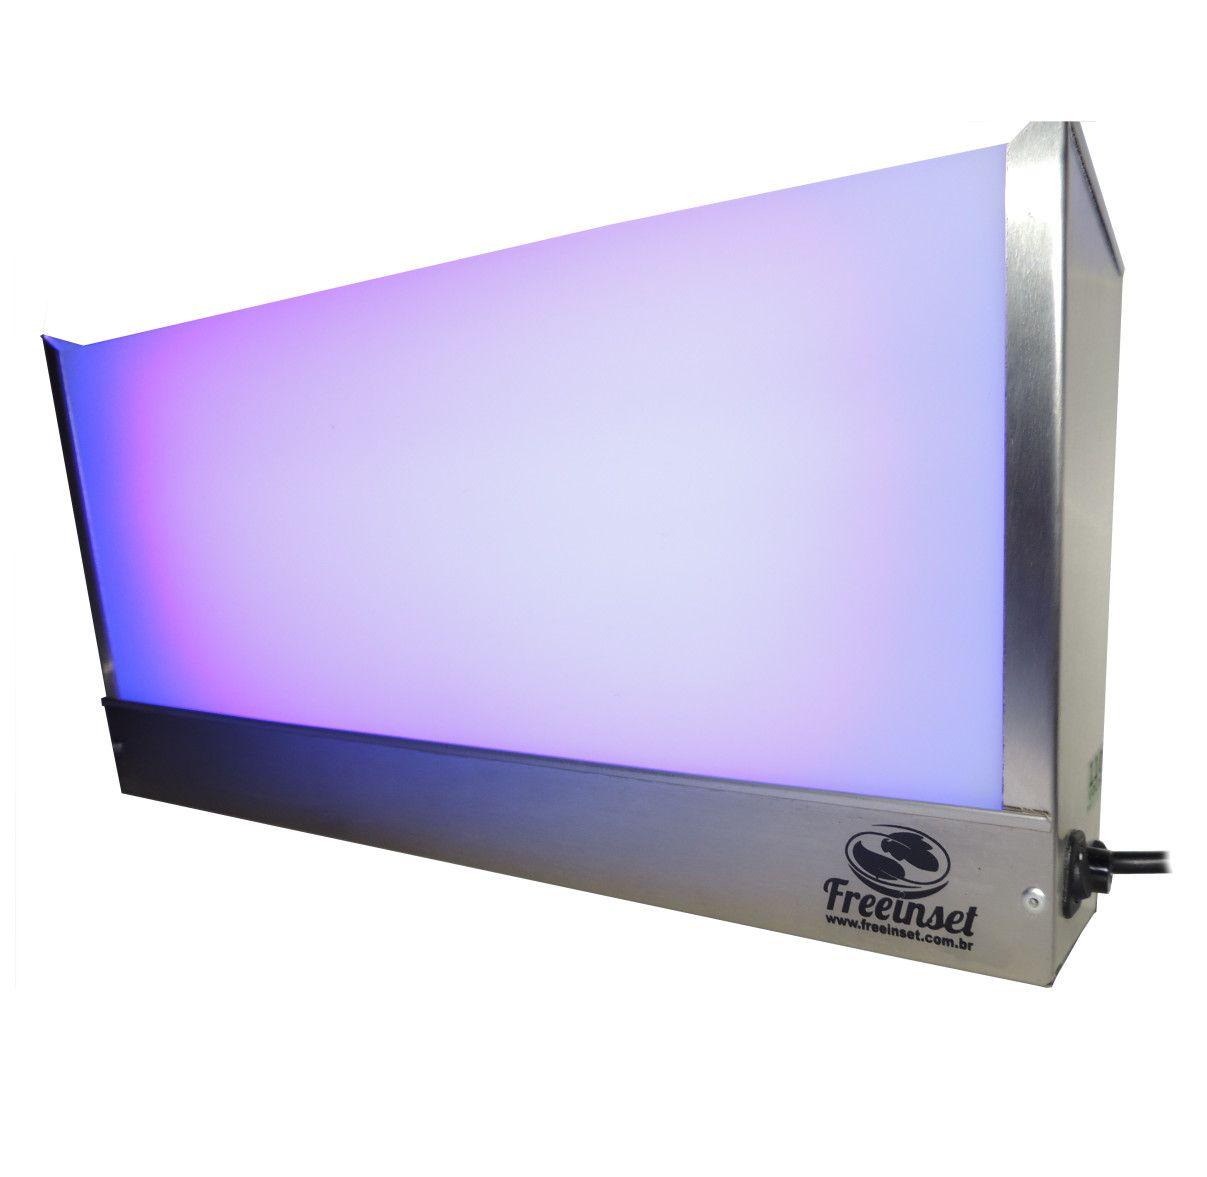 Armadilhas Luminosas TOP, 45w, até 80m², Bivolt, Aço Inox Escovado